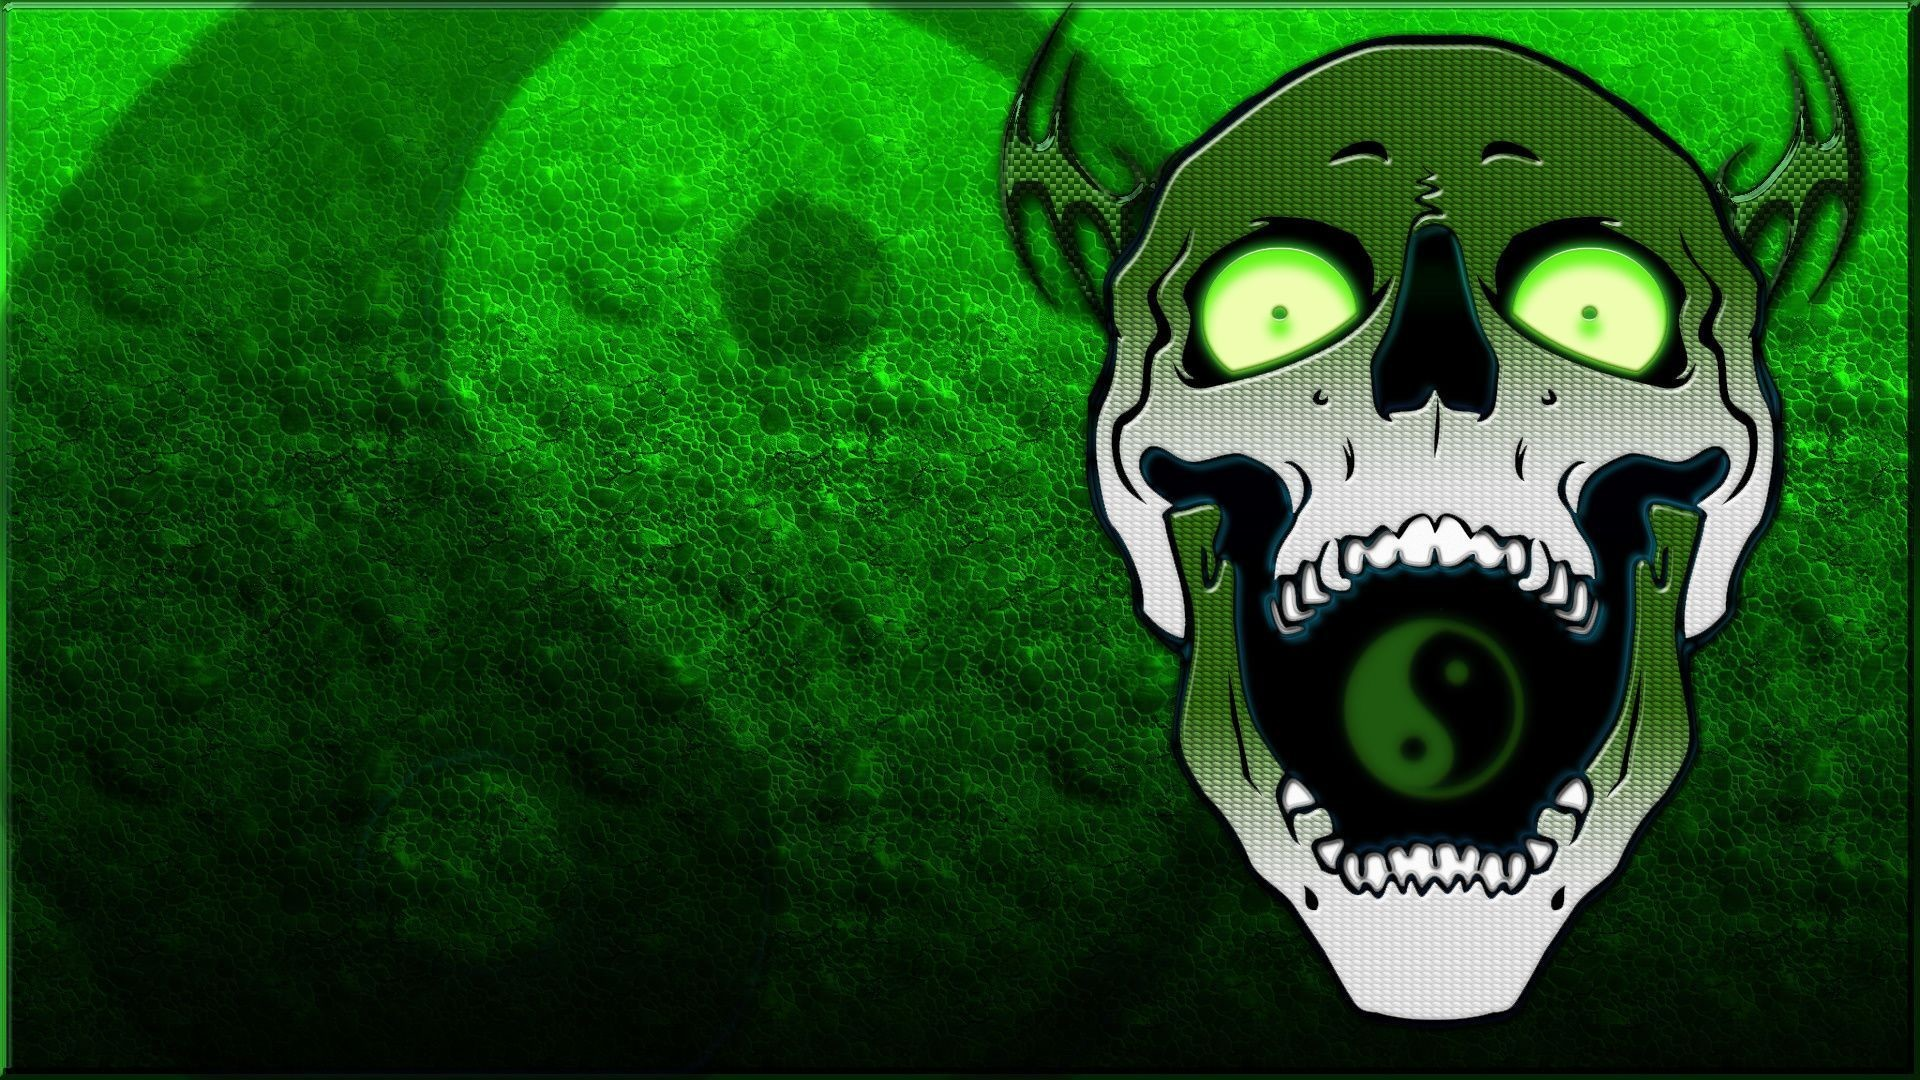 Skull yin yang wallpaper